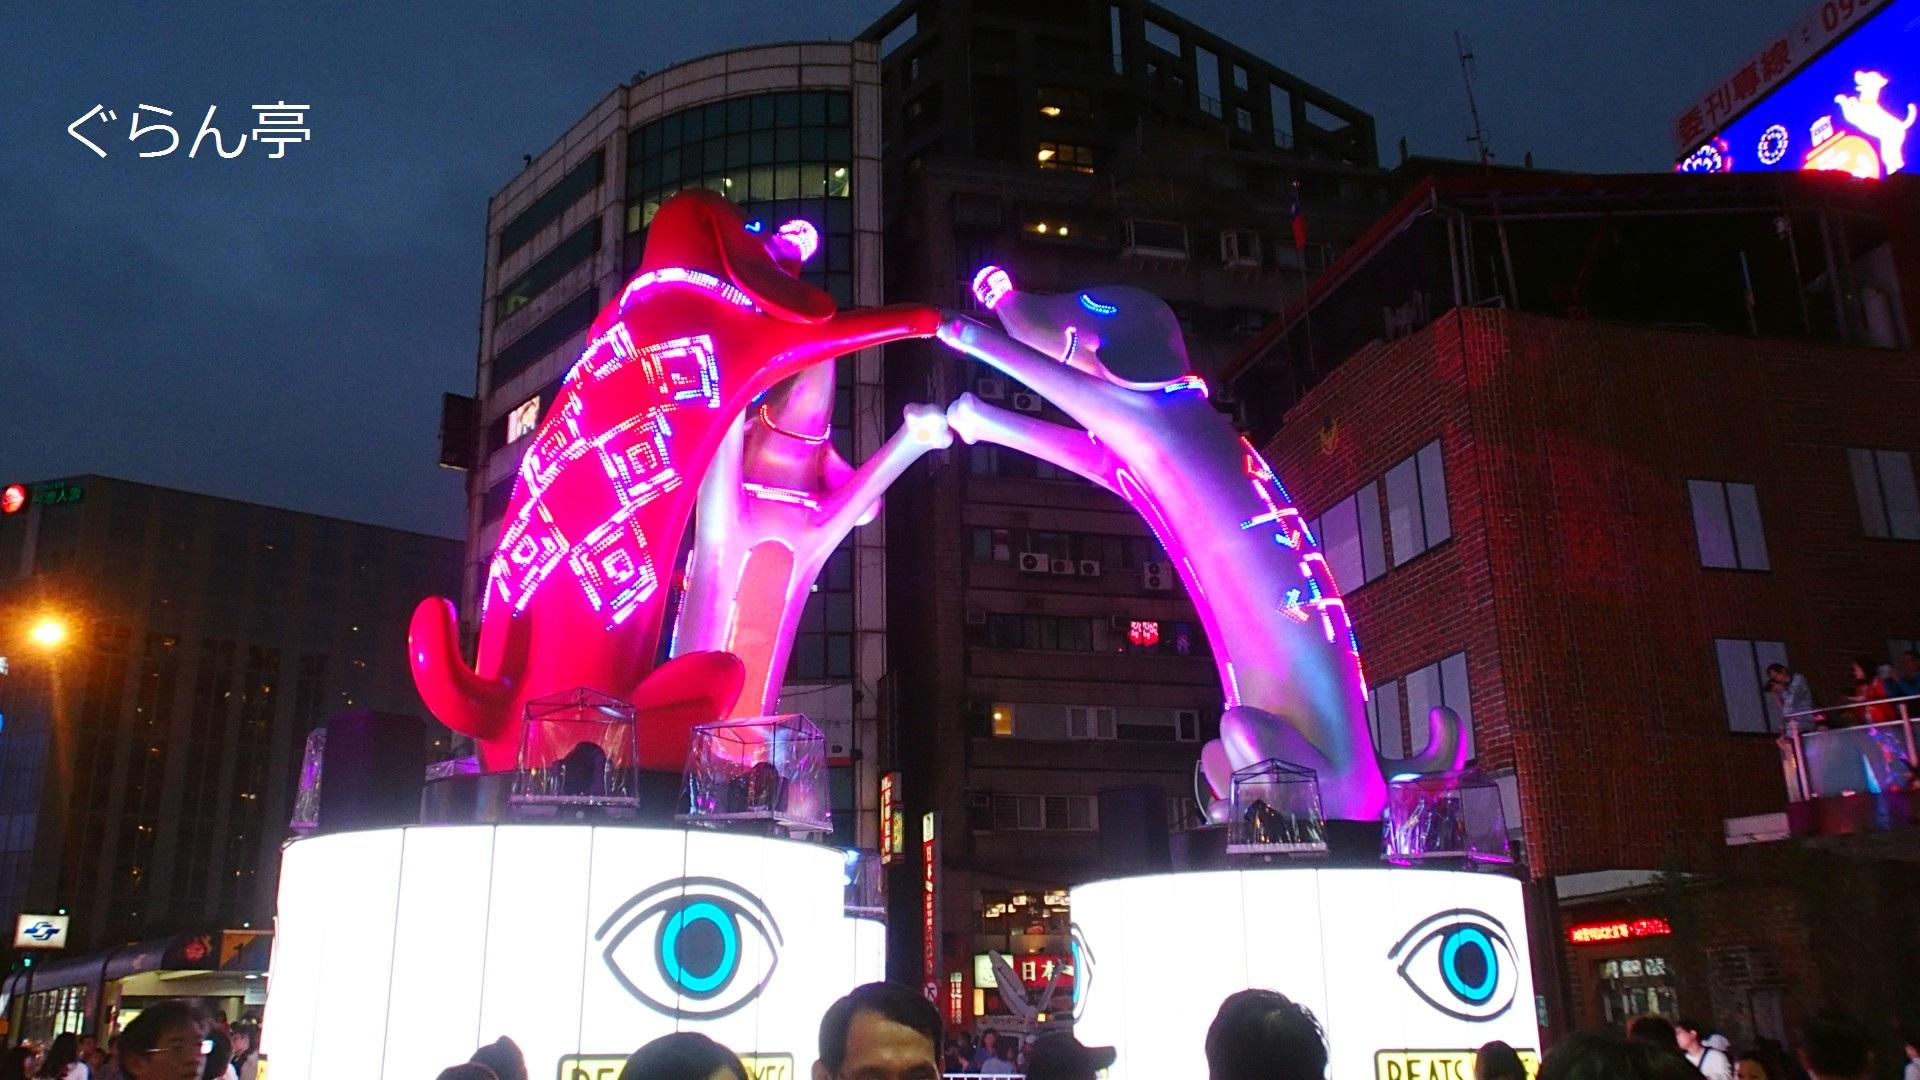 201803_台北_夜の西門_3